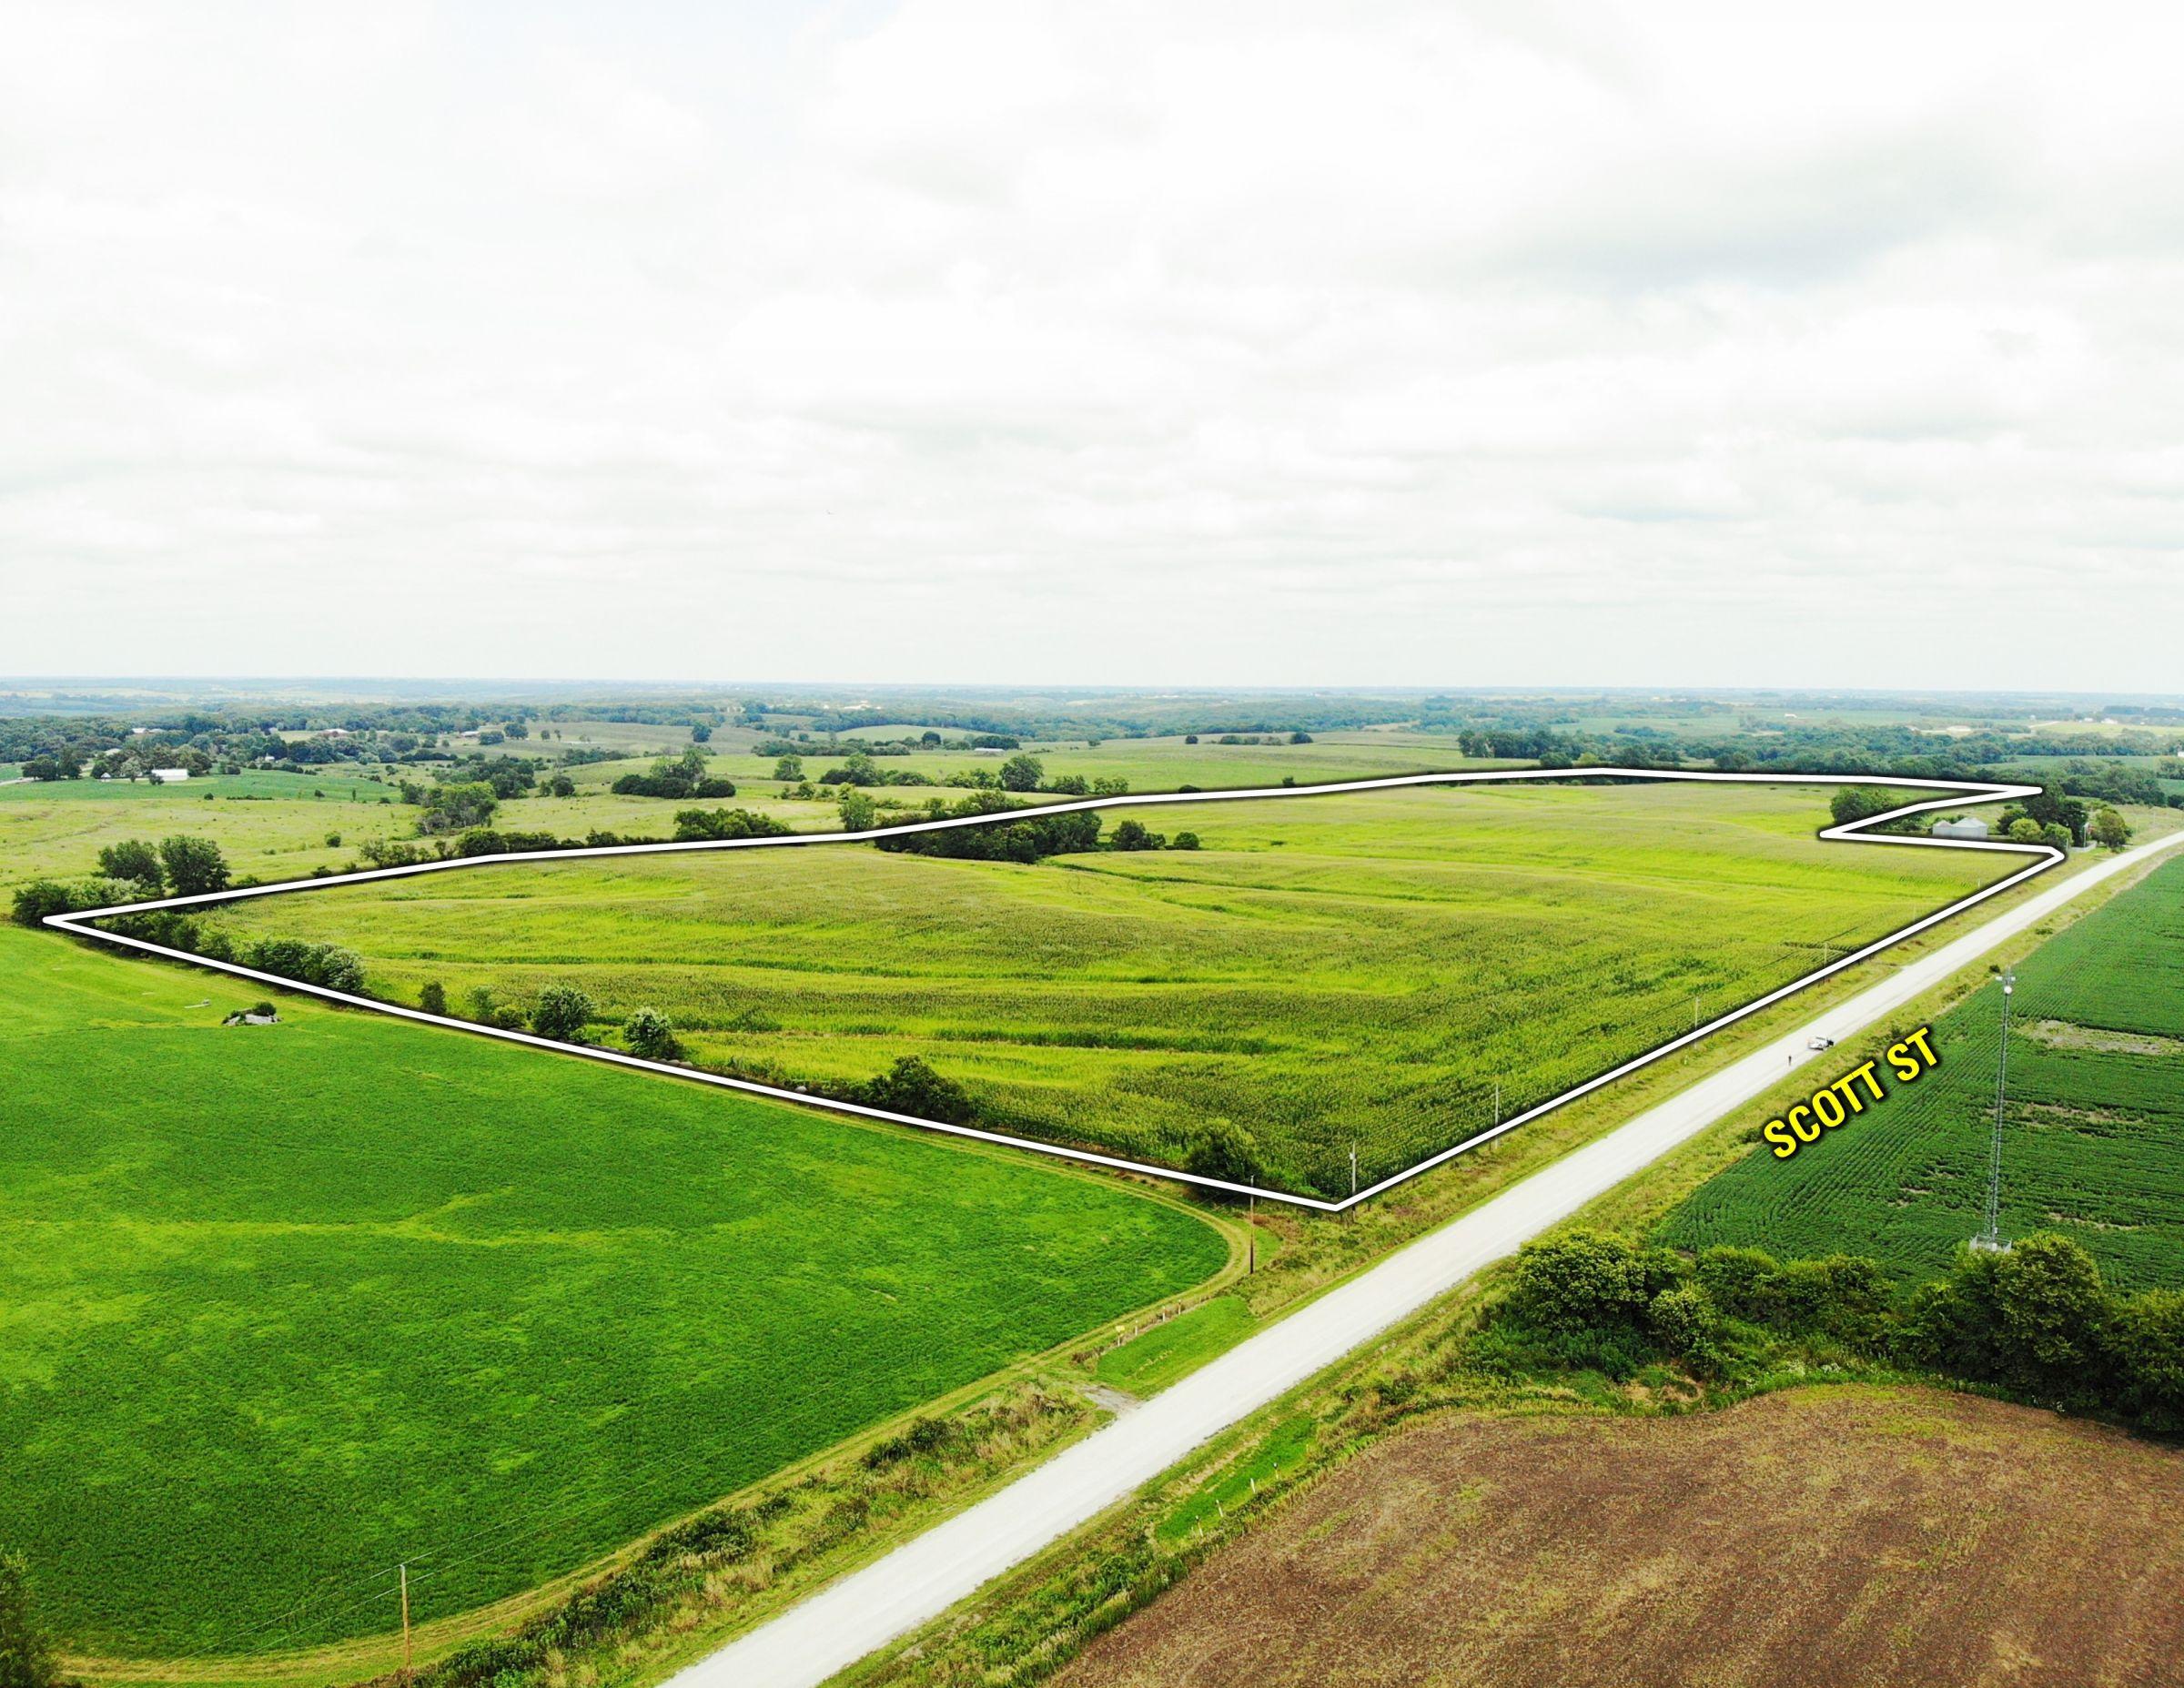 land-clarke-county-iowa-72-acres-listing-number-15106-1-2020-08-09-034301.jpg